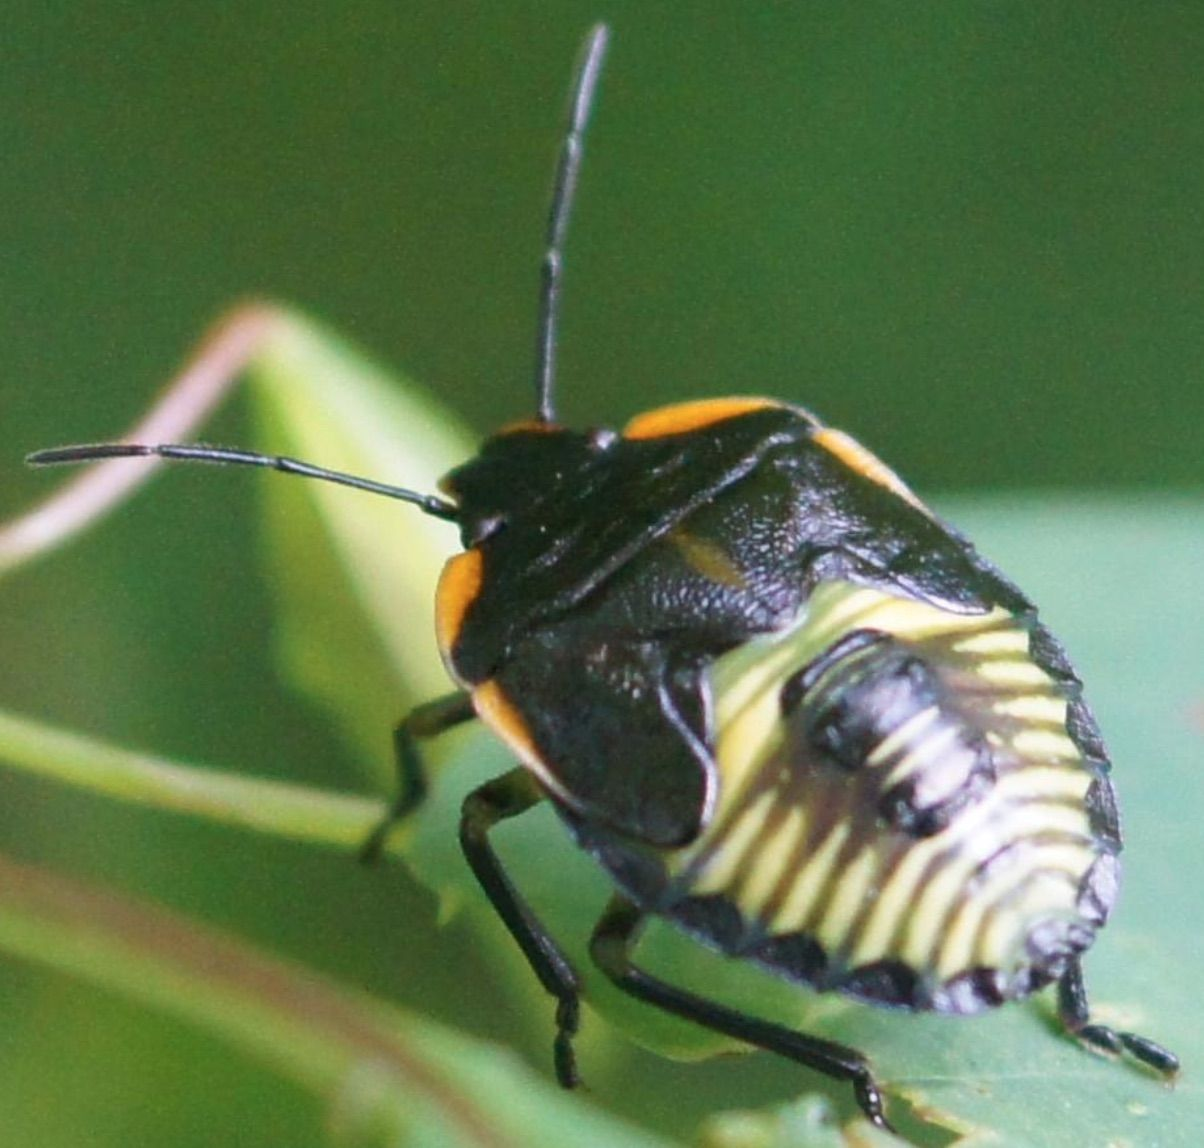 green stink bug (Chinavia hilaris) Insect identification